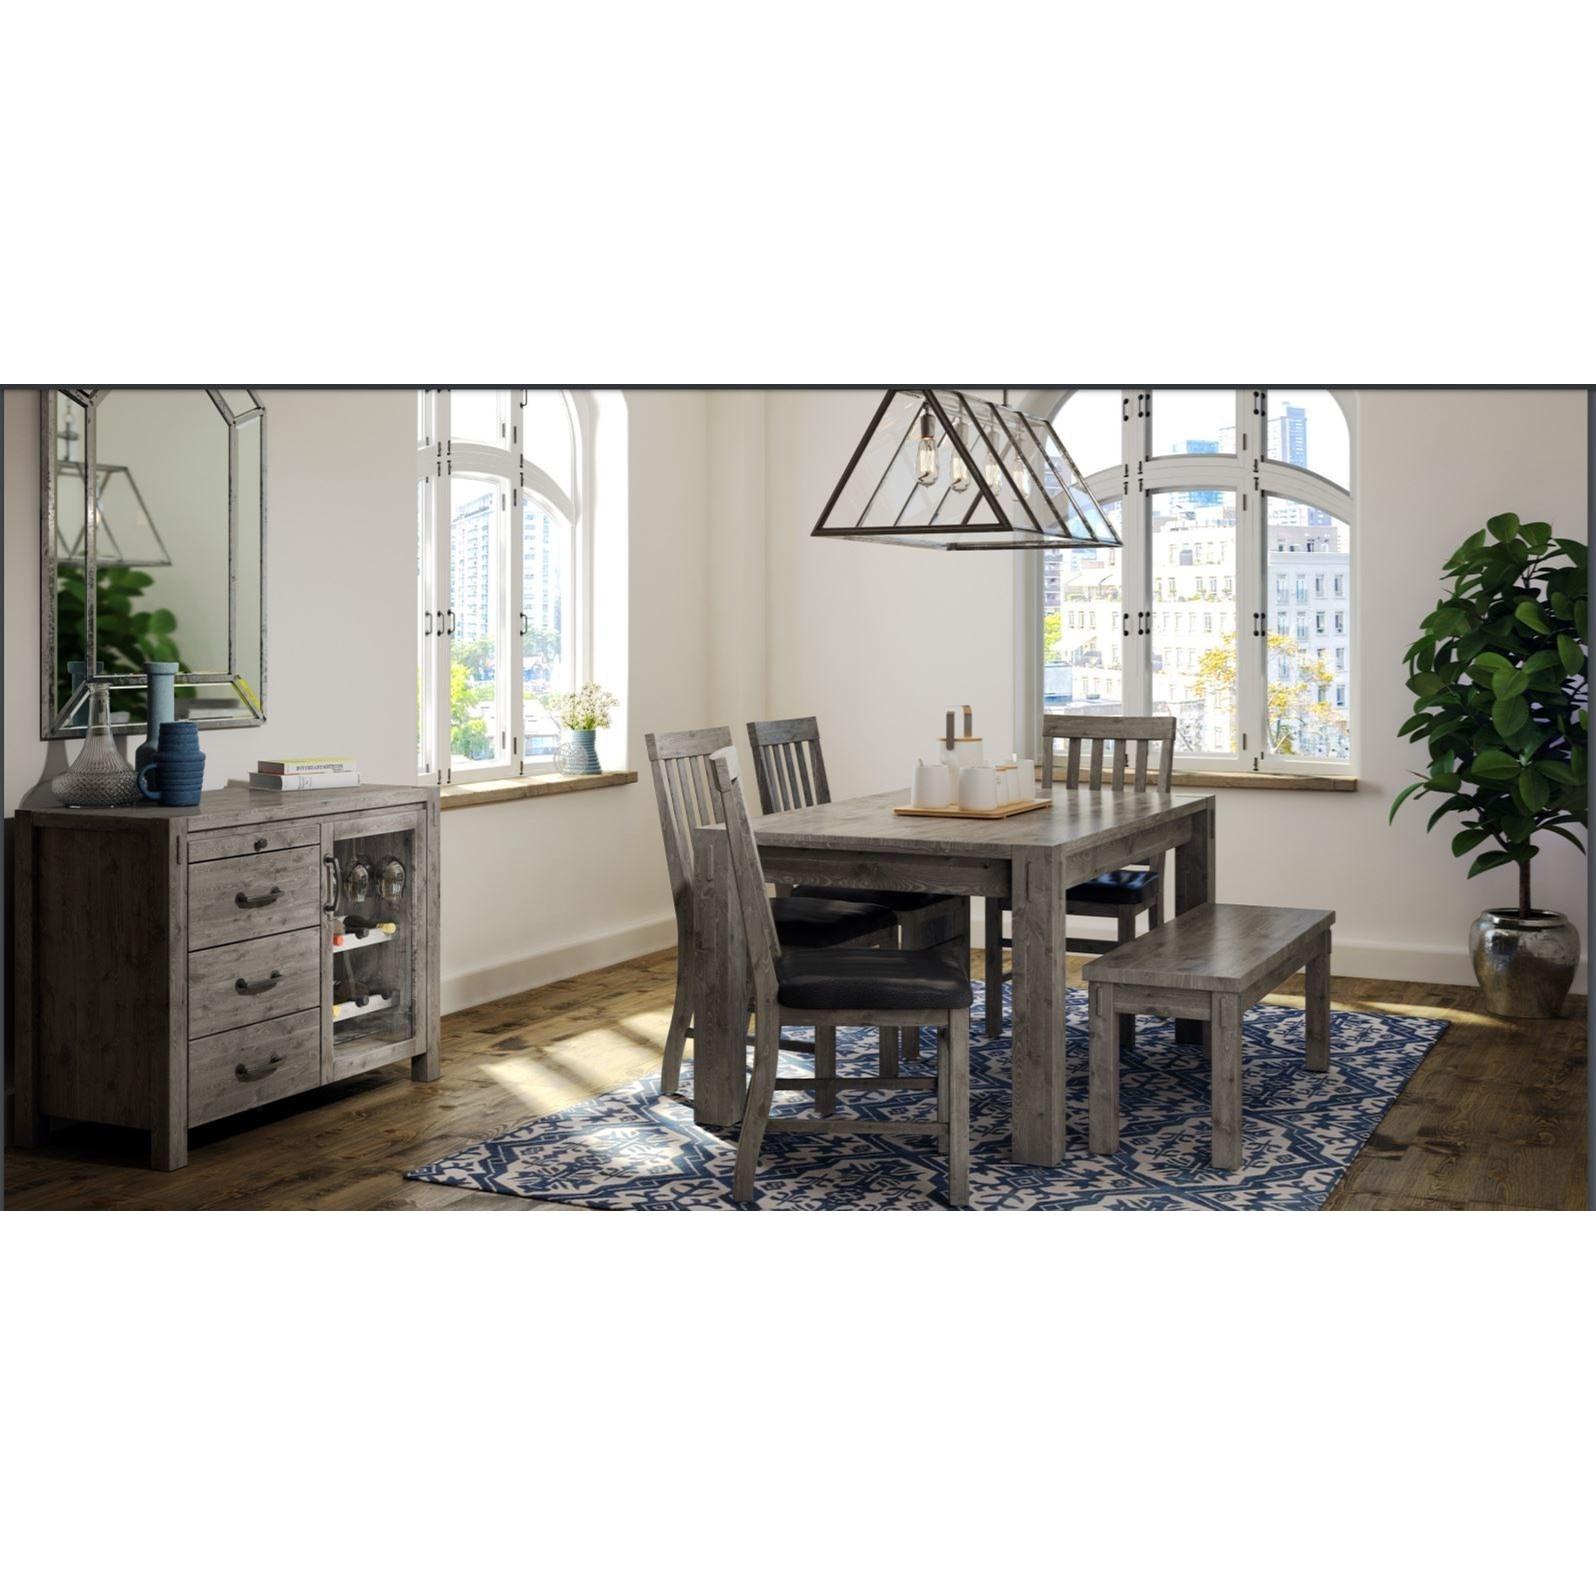 sofas hamilton ontario modern ireland defehr stockton wood dining bench stoney creek furniture